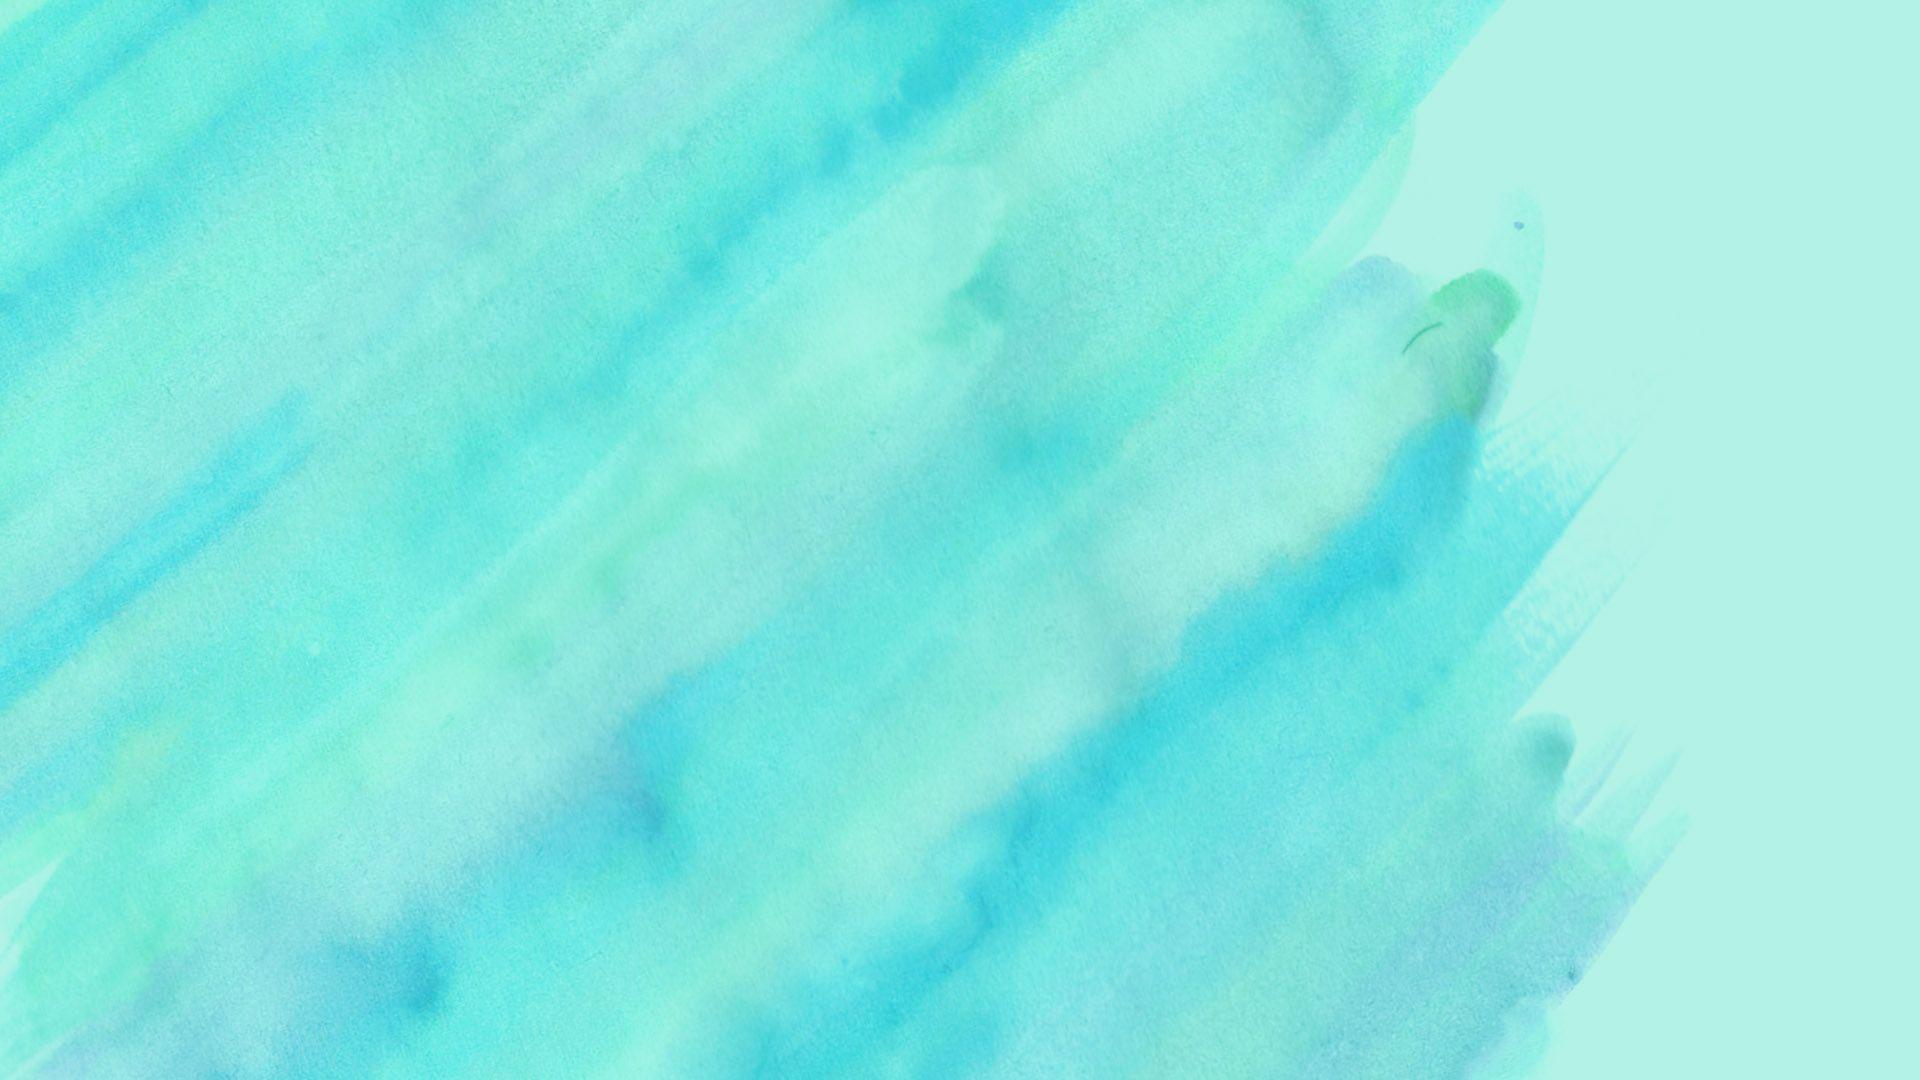 blue watercolor wallpaper  Images blue watercolor desktop. | Wallpapers | Pinterest | Watercolor